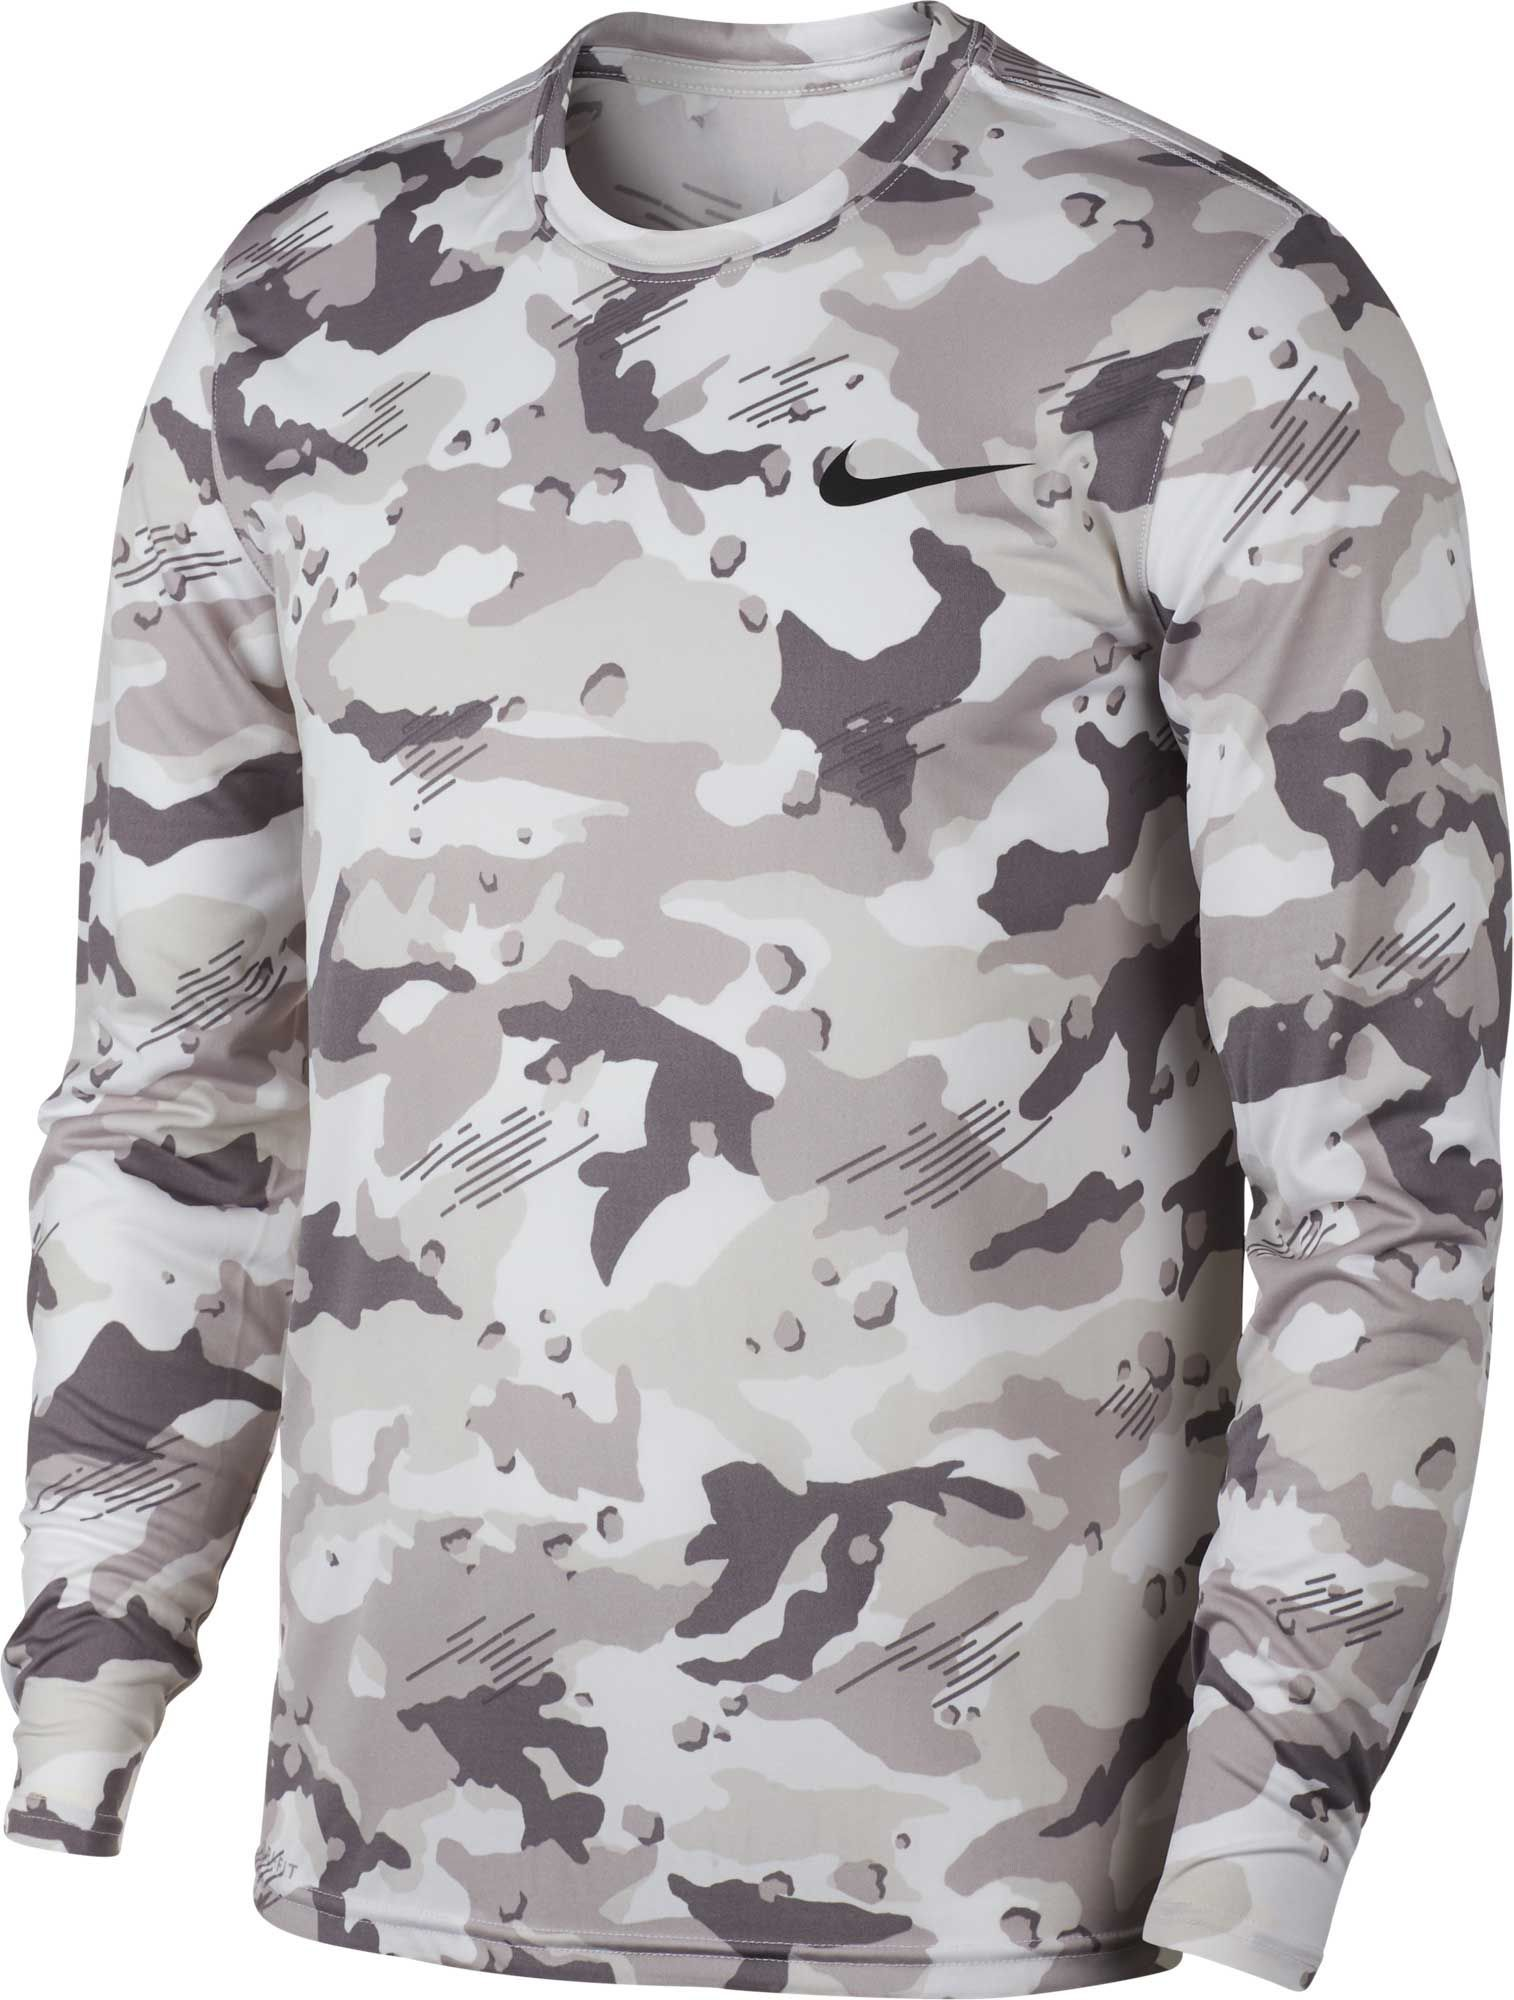 b926c7d56d206d Nike Men's Dry Legend Camo Long Sleeve Tee | Products | Nike men ...